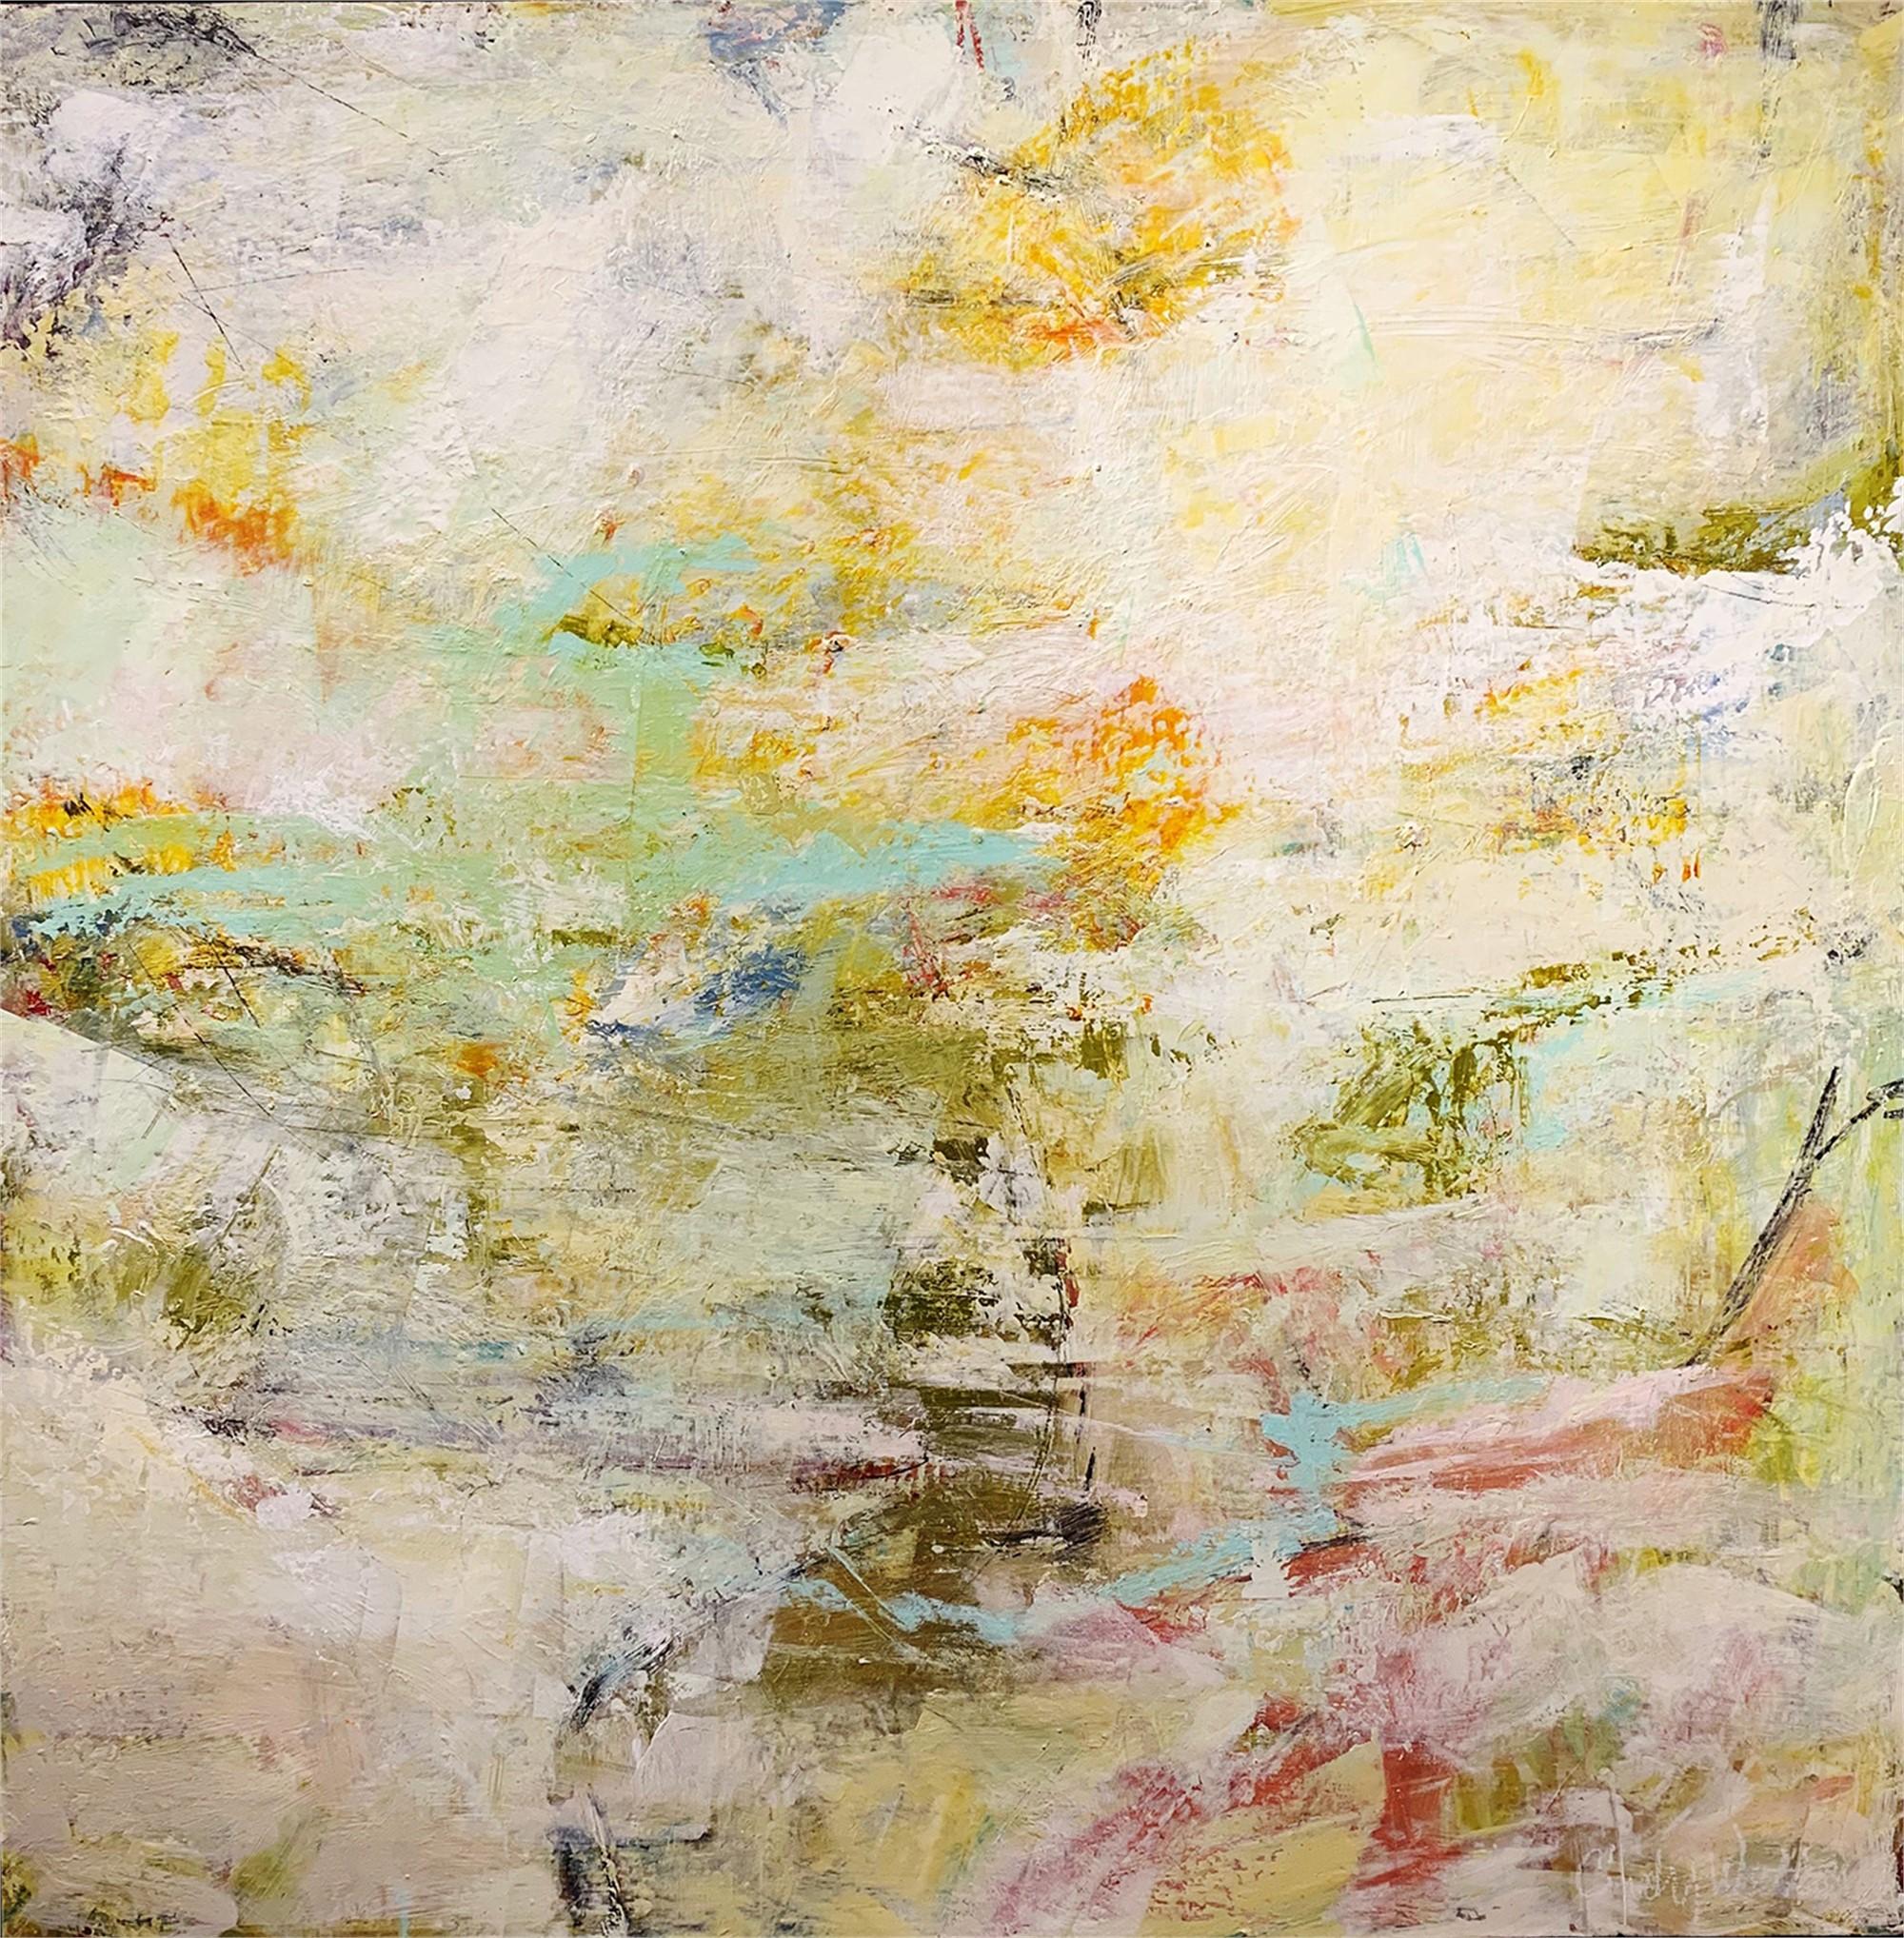 Morning Reflection by Cindy Walton